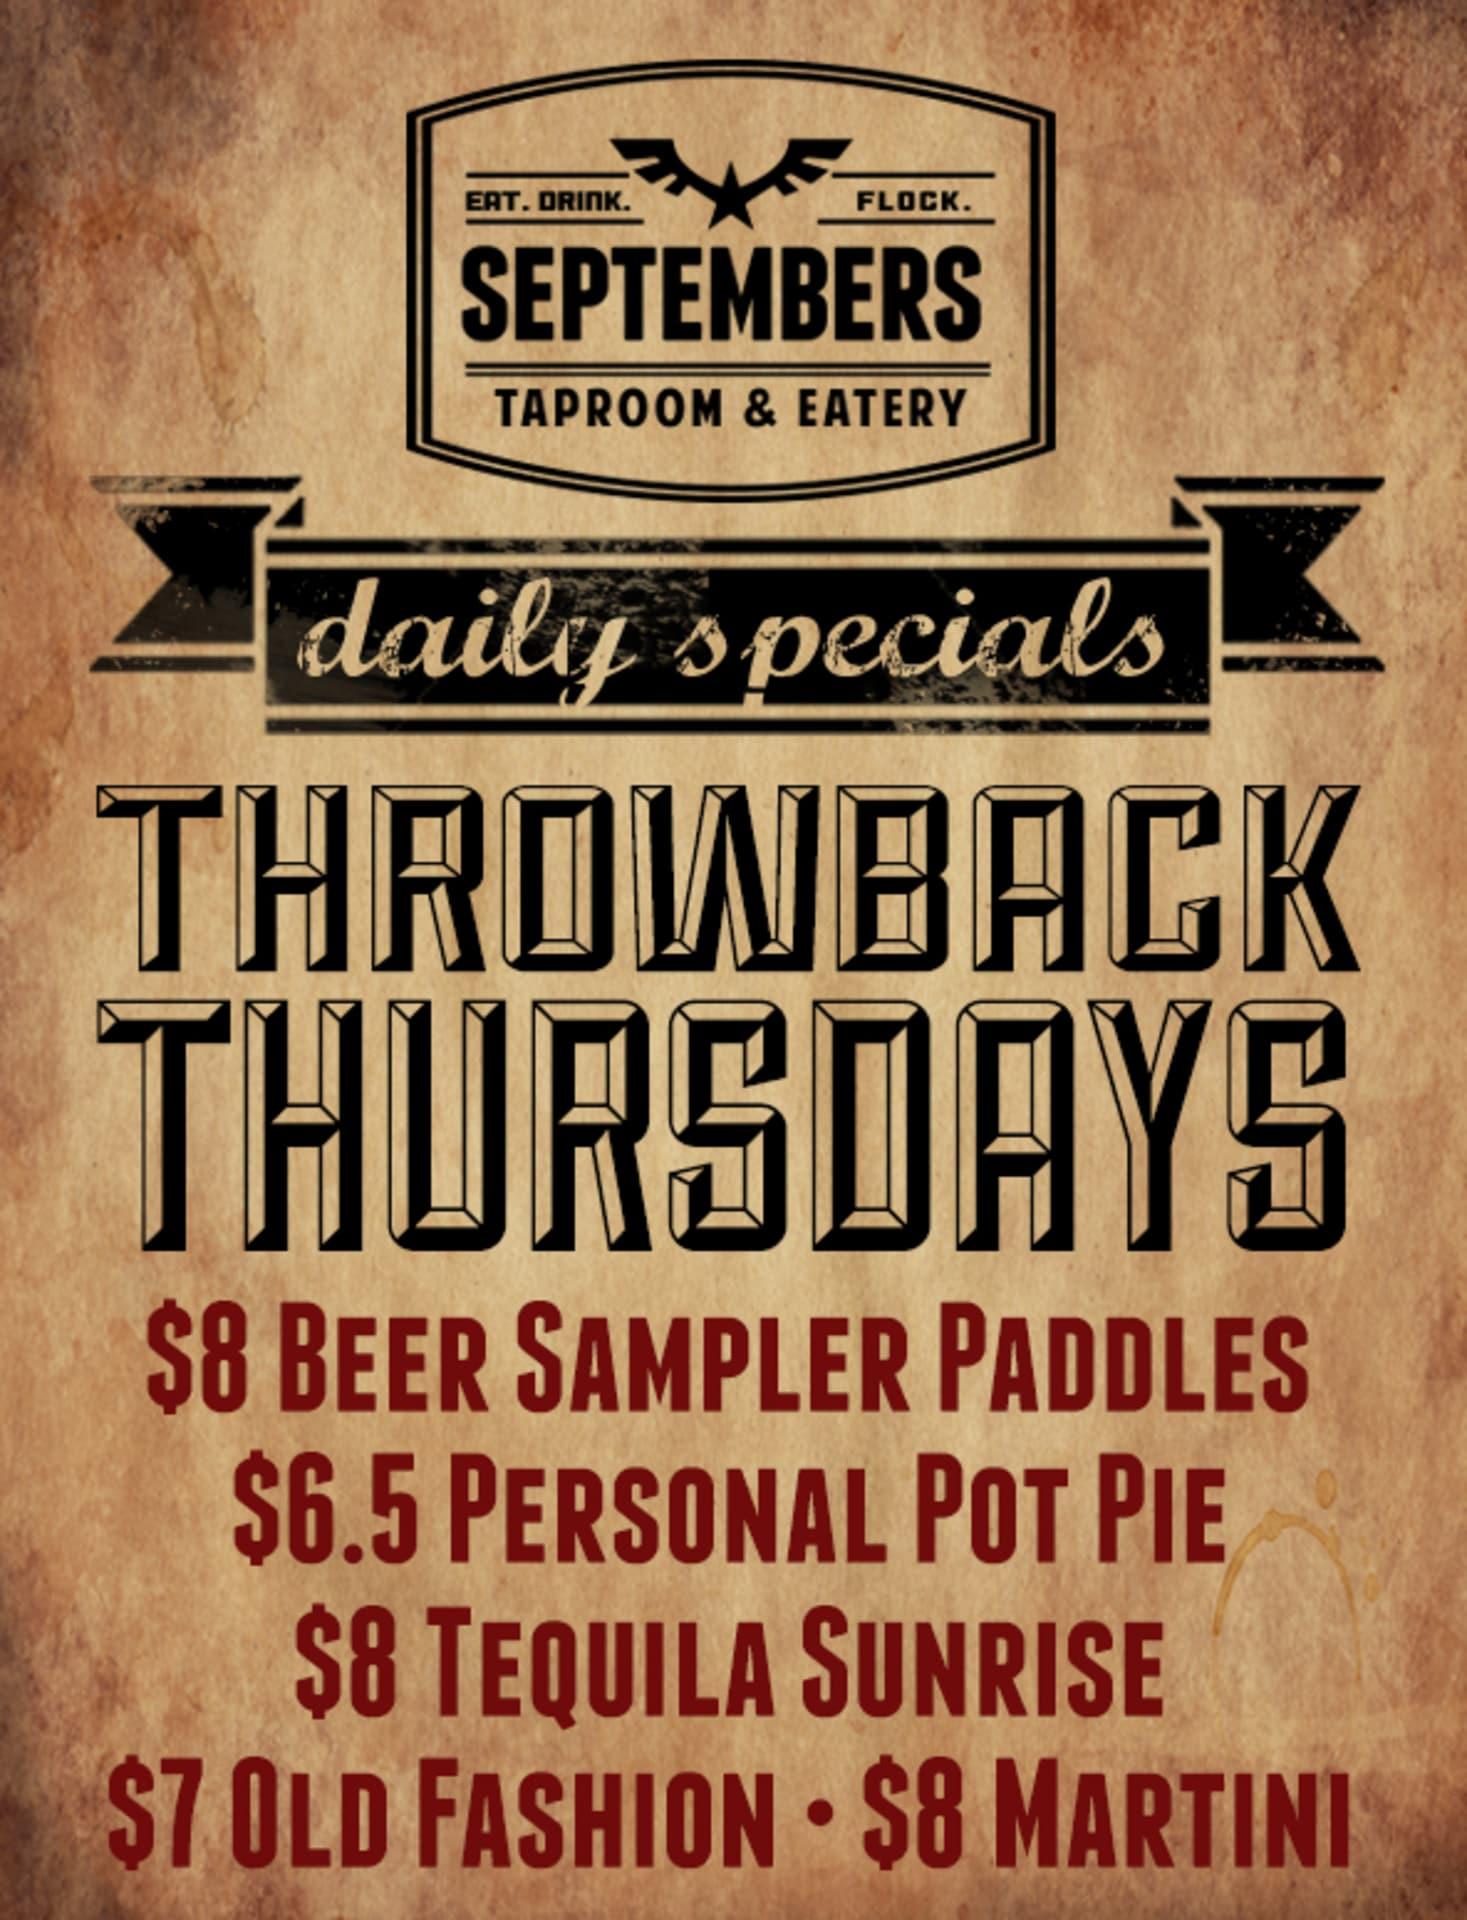 Thursday   Throwback Thursday